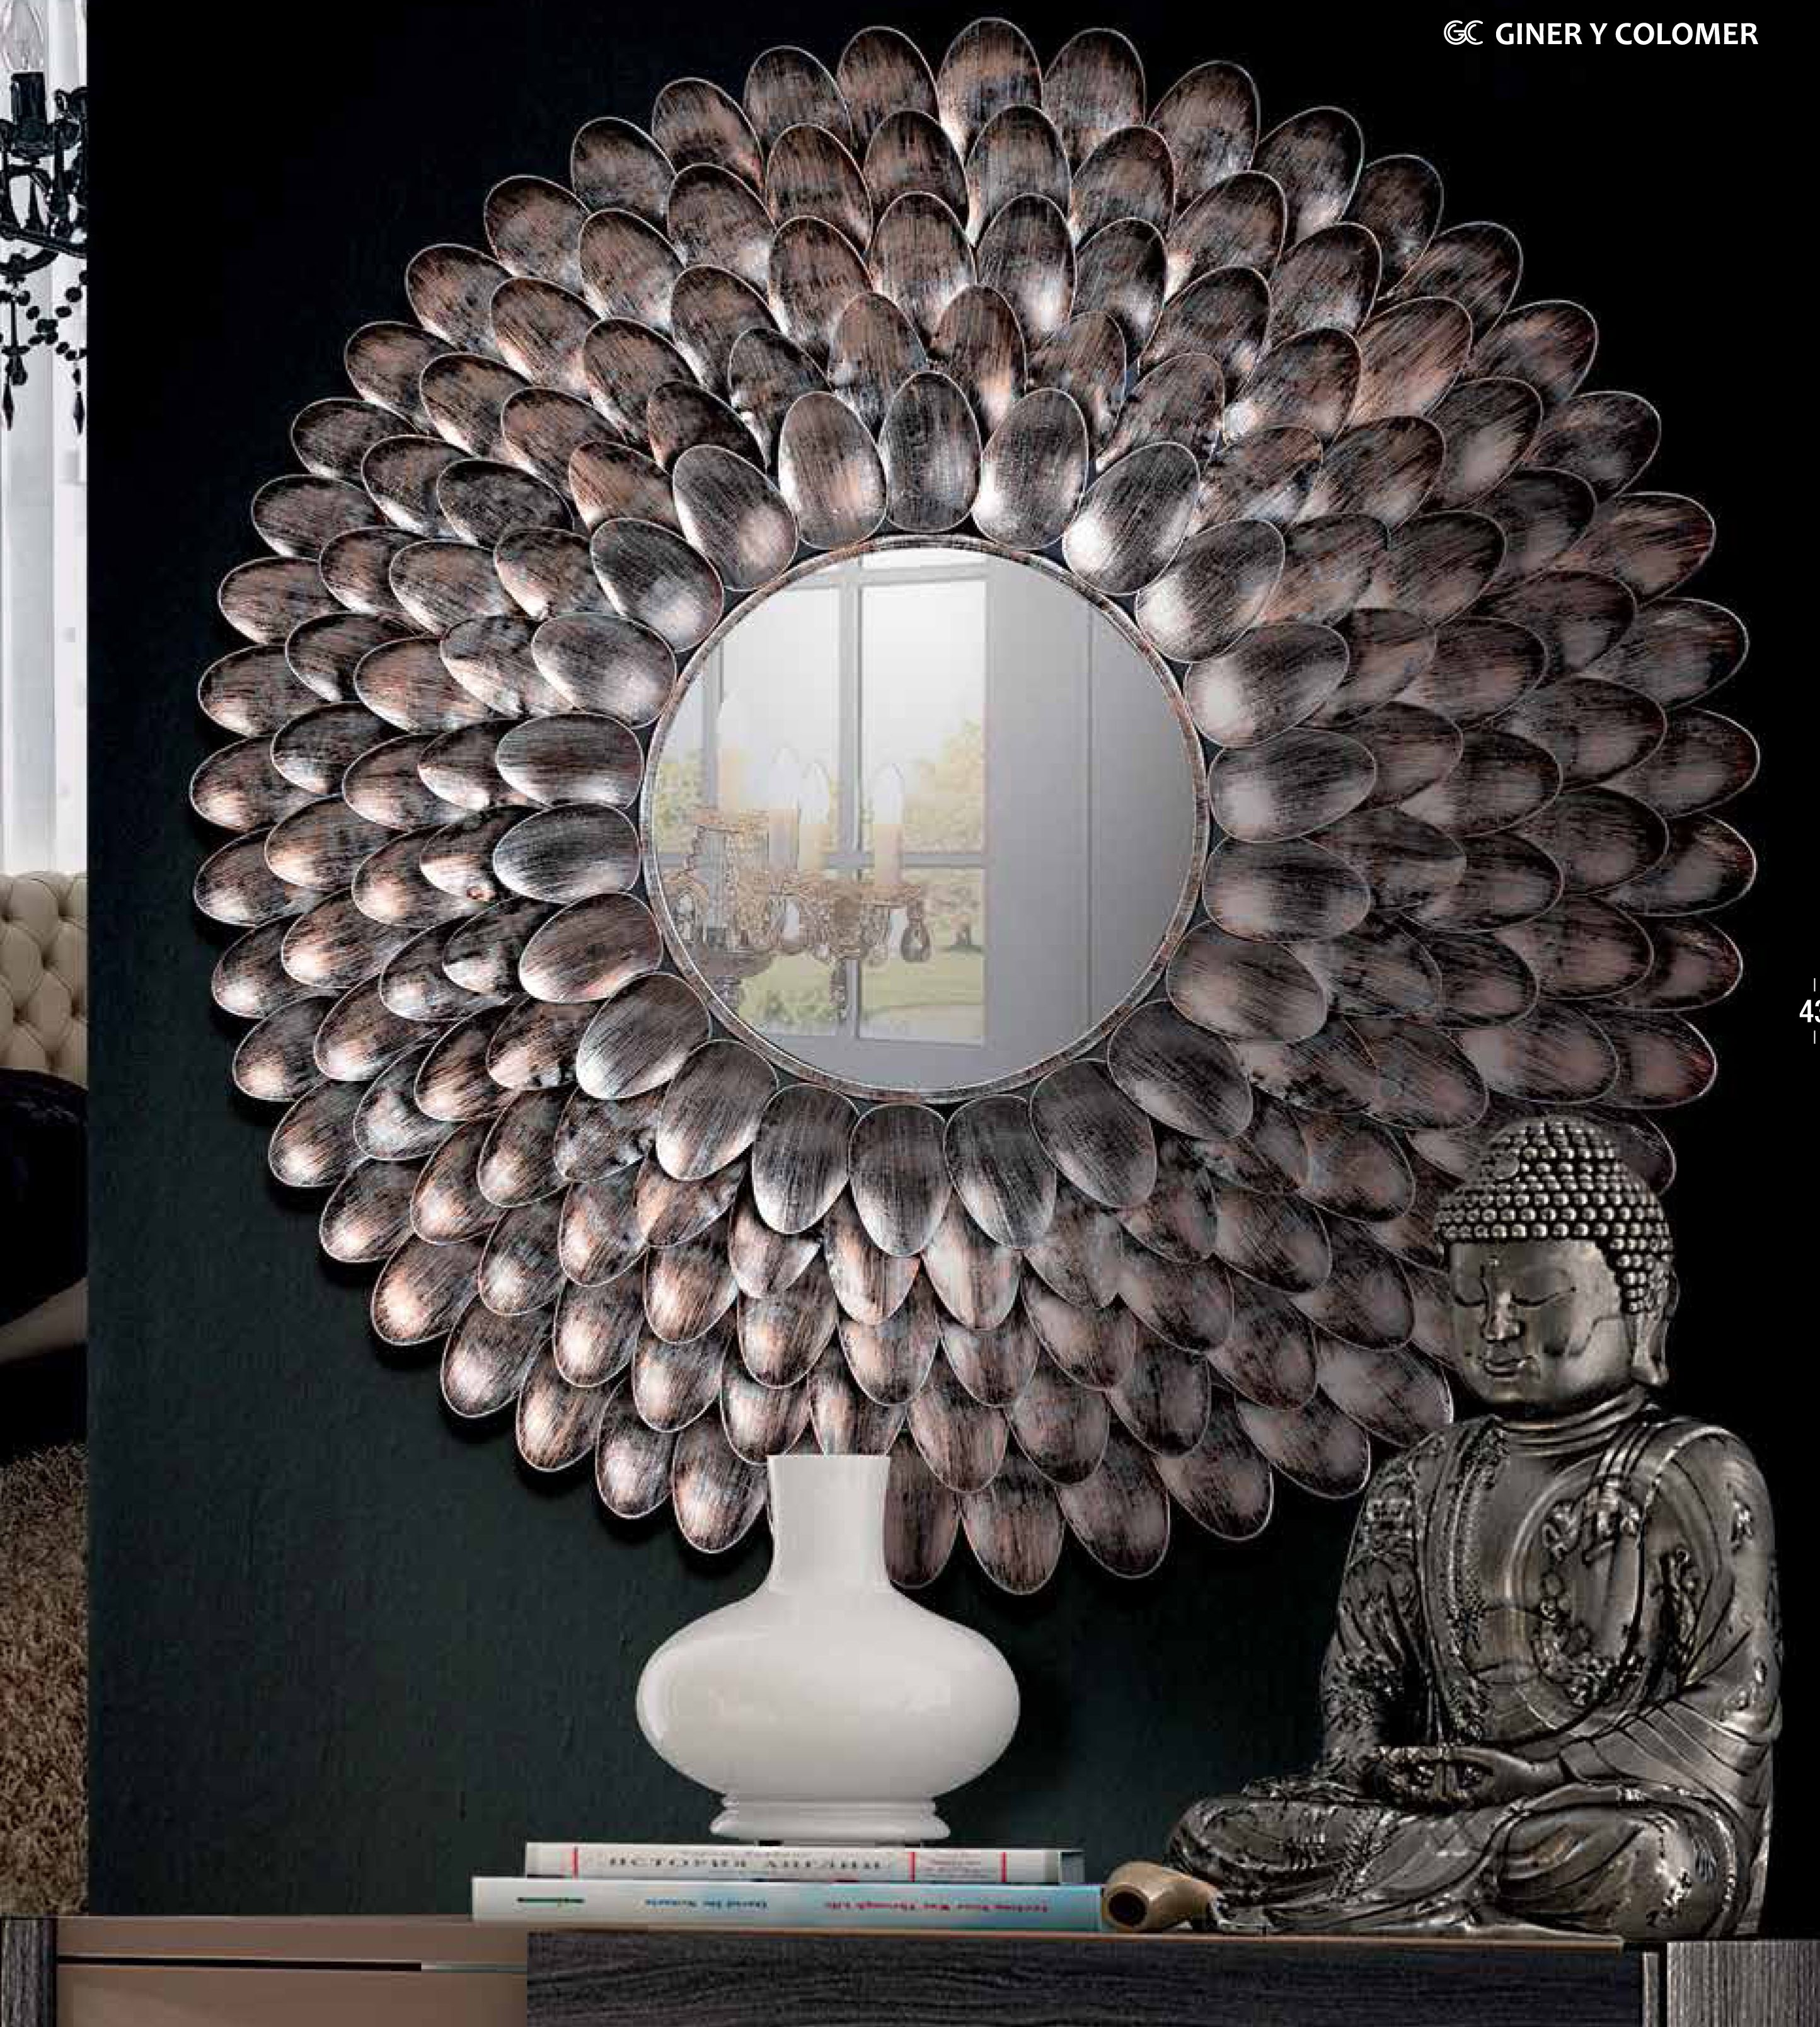 Espejo Moderno Espejo Decorativo Espejo Grande Espejo De Dise O  # Muebles Giner Y Colomer